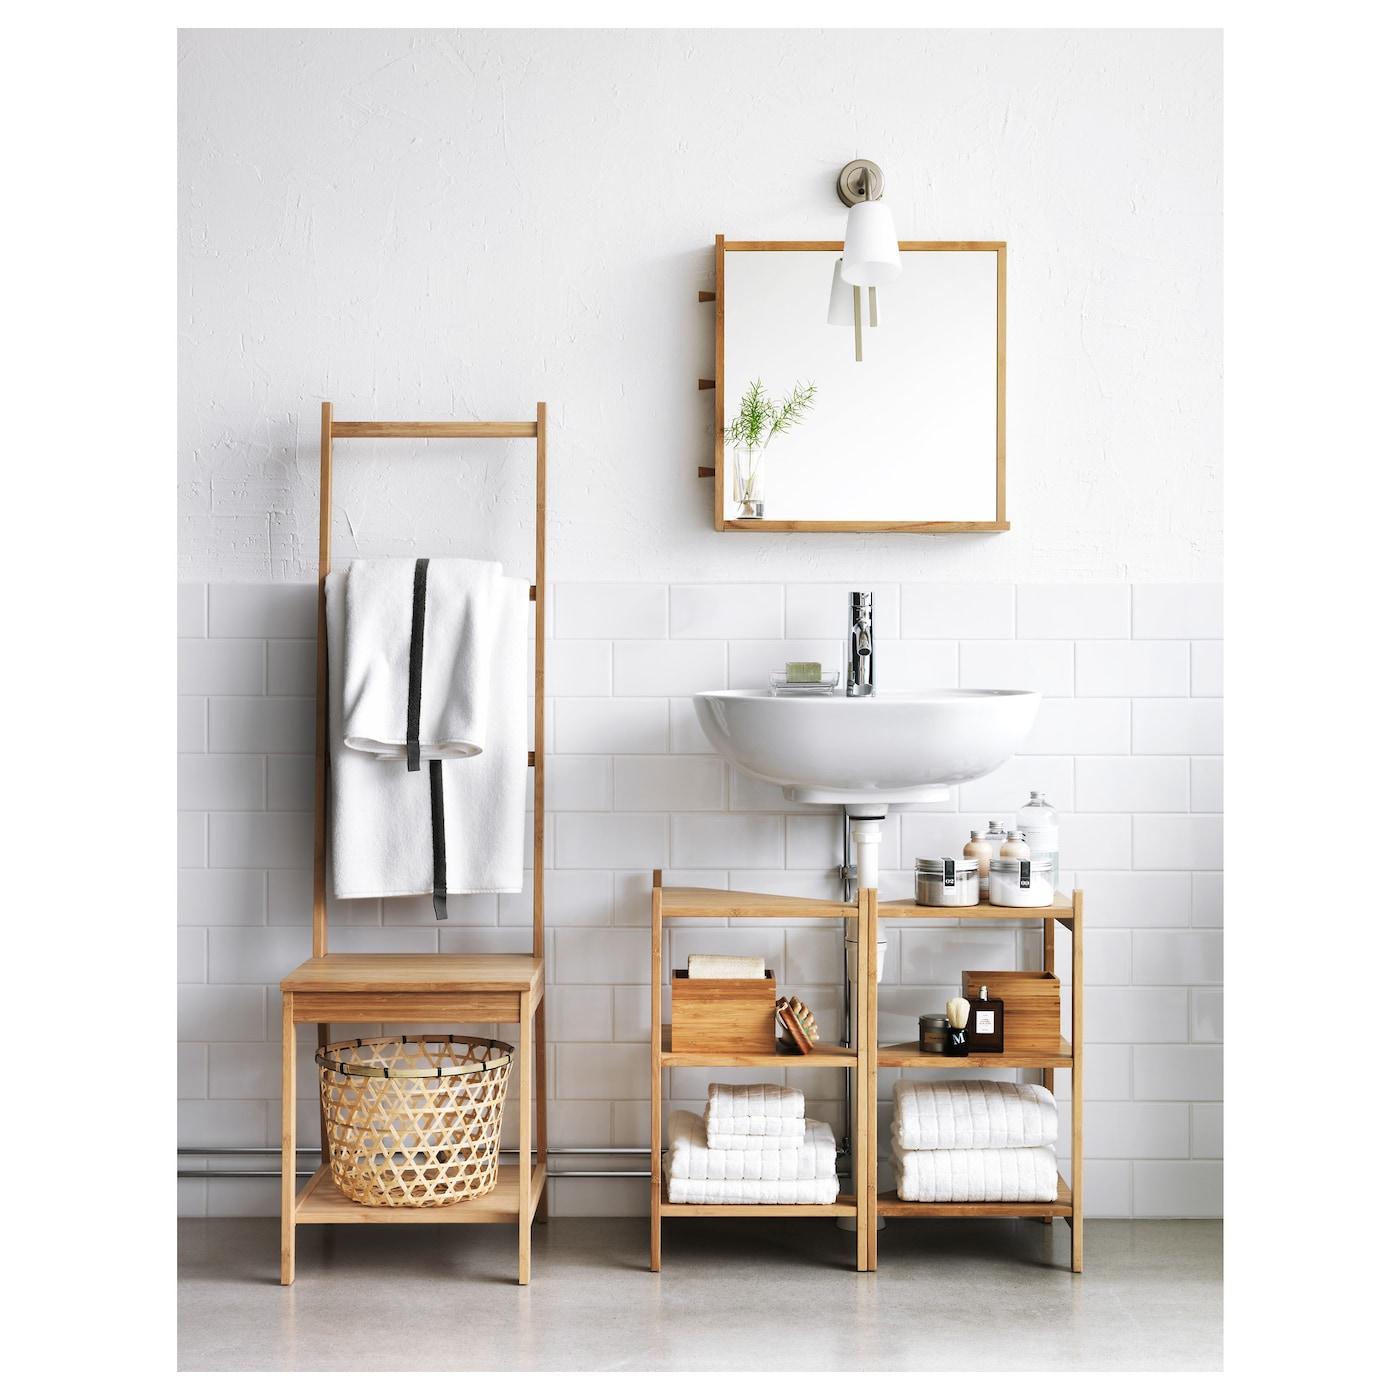 RÅGRUND Chair with towel rack - bamboo